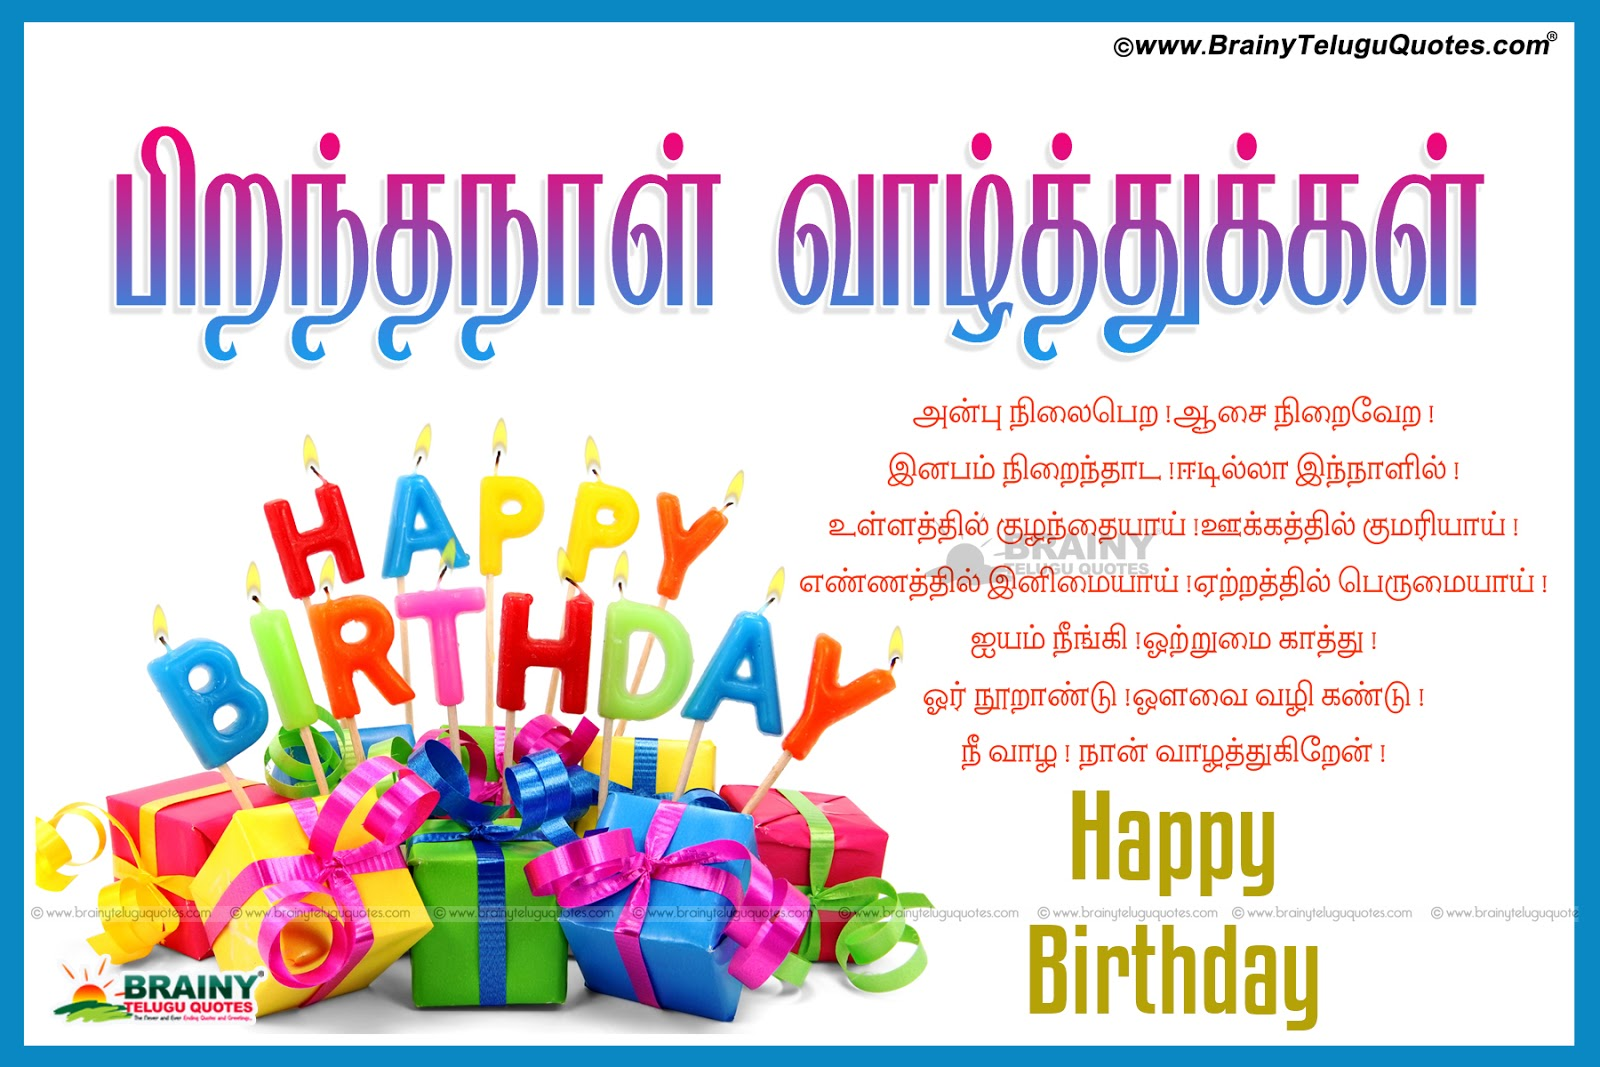 Tamil Birthday Sms Pirantha Naal Birthday Wishes Brainyteluguquotes Comtelugu Quotes English Quotes Hindi Quotes Tamil Quotes Greetings